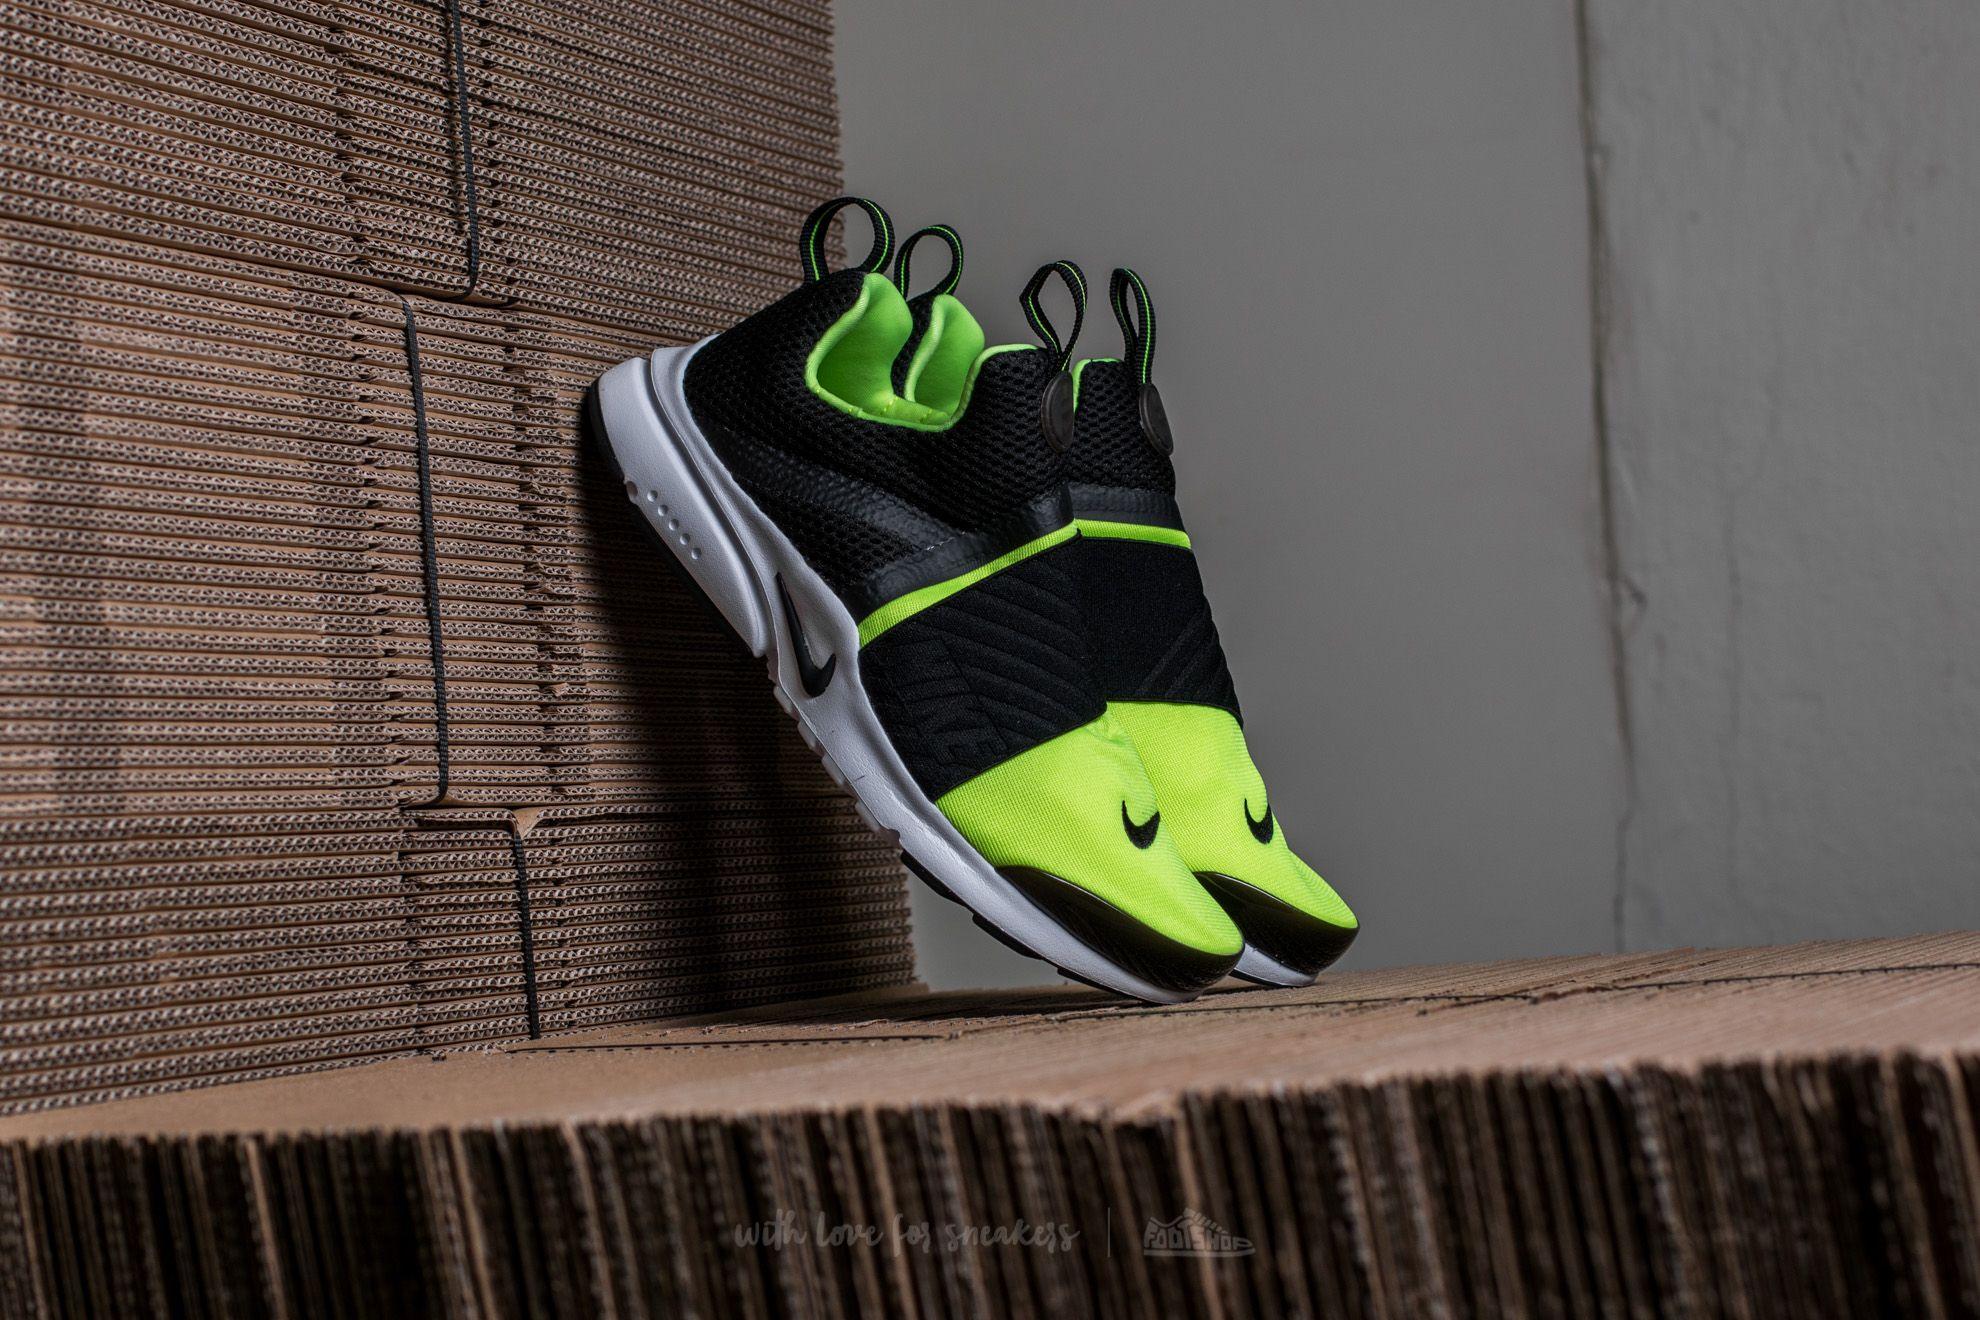 official photos 6f797 14790 Nike Presto Extreme (GS) Volt/ Black-White | Footshop